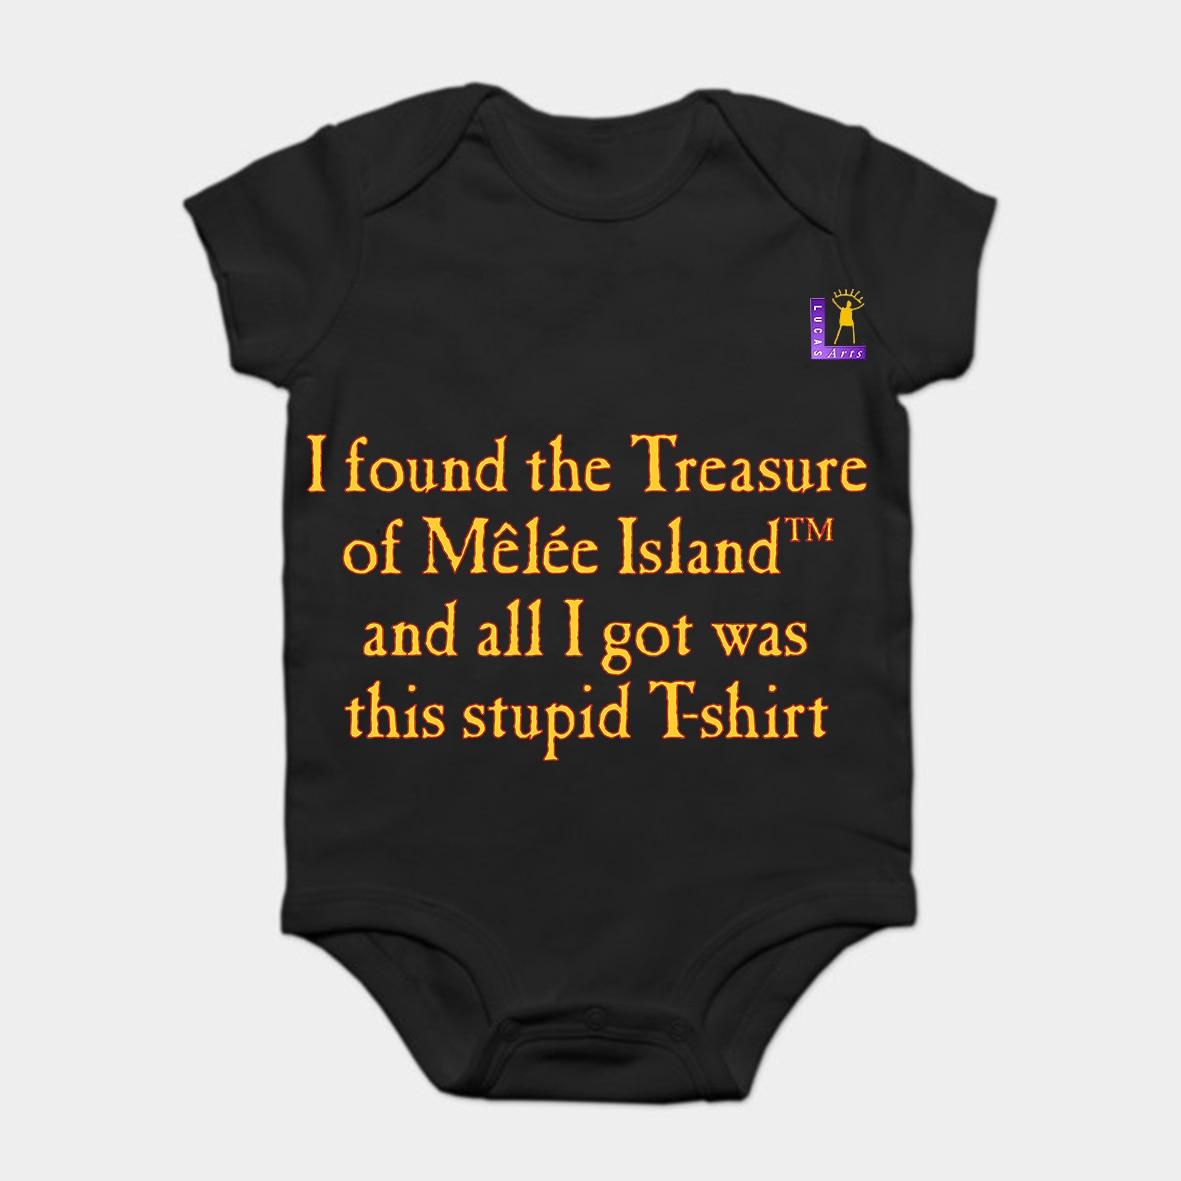 Baby Onesie Baby Bodysuits kid t shirt Fashion Cool Funny MONKEY ISLAND TREASURE TROVE Customized Printed